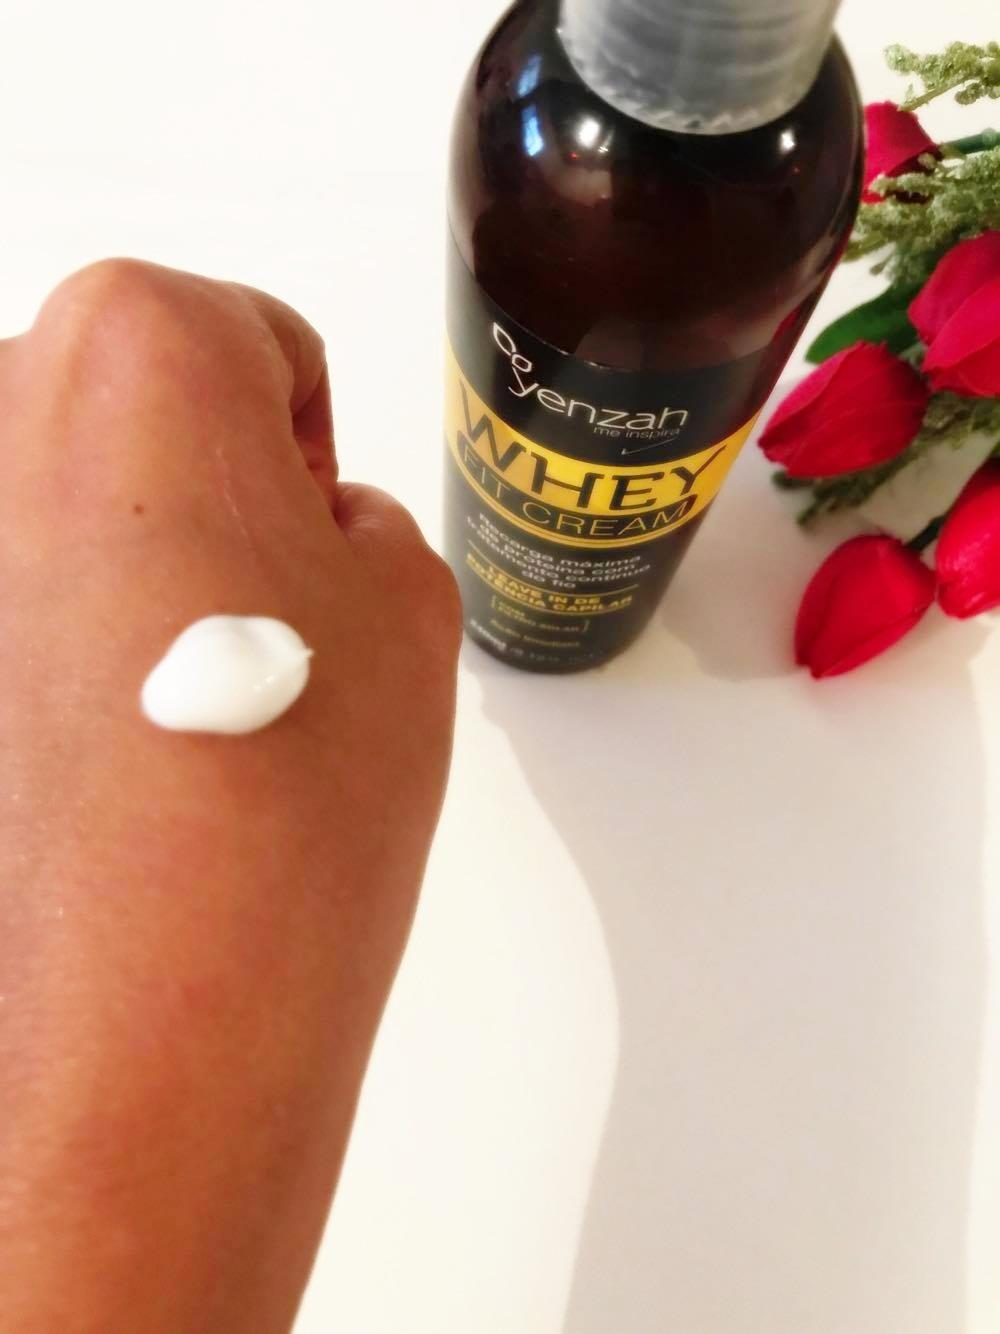 Leave in Whey fit cream da Yenzah